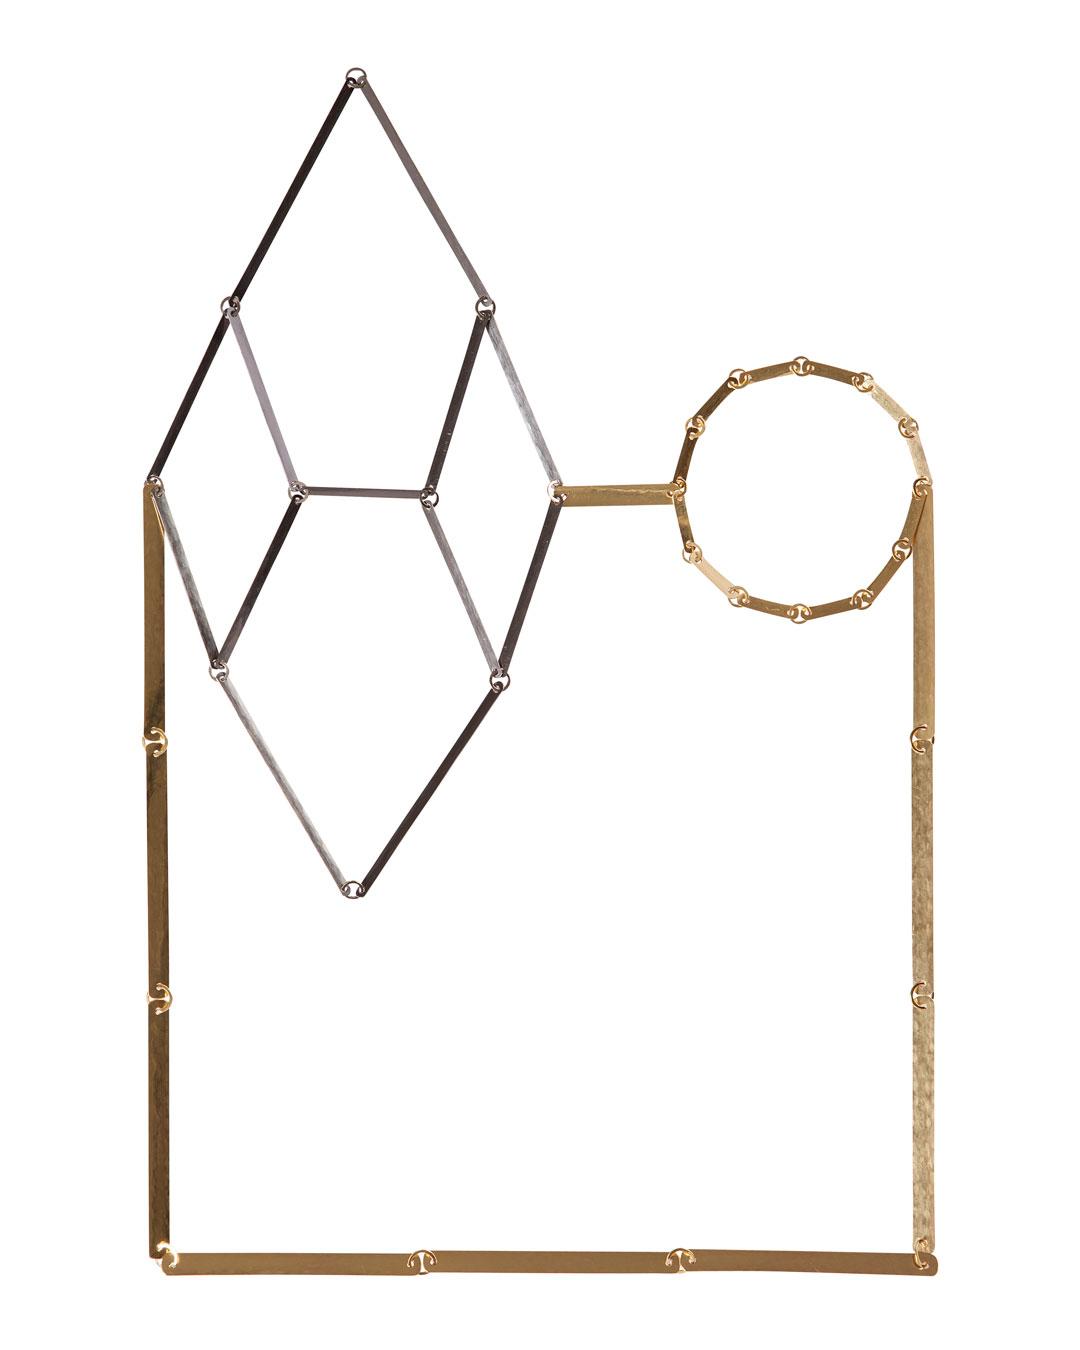 Annelies Planteijdt, Mooie Stad – Zwarte Kristal (Beautiful City – Black Crystal), 2015 (1/5), necklace; gold, tantalum, 180 x 270 mm, €8150 (image 1/2)